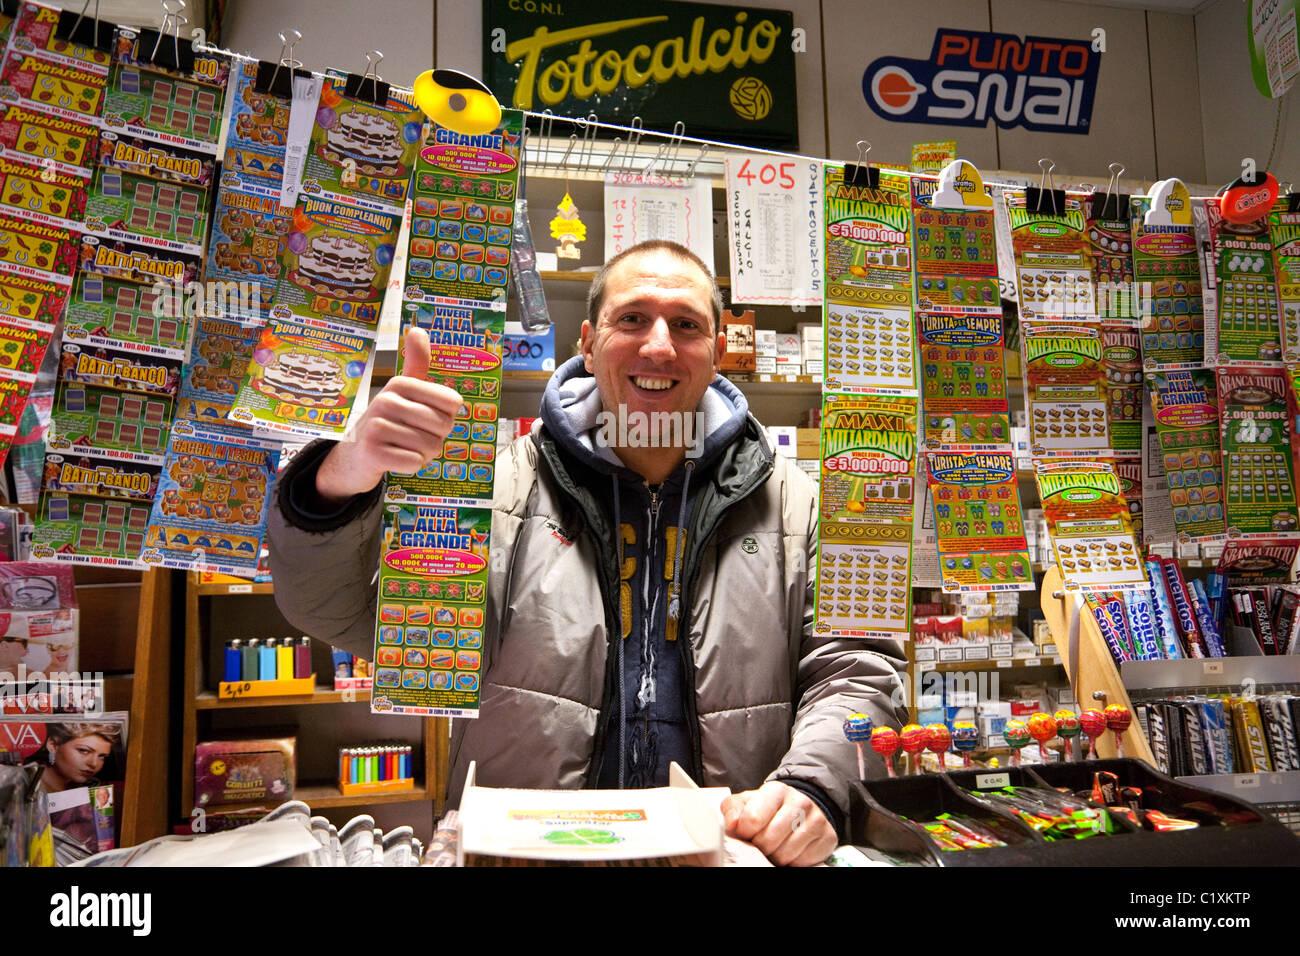 Lottery ticket seller, Venice, Italy - Stock Image